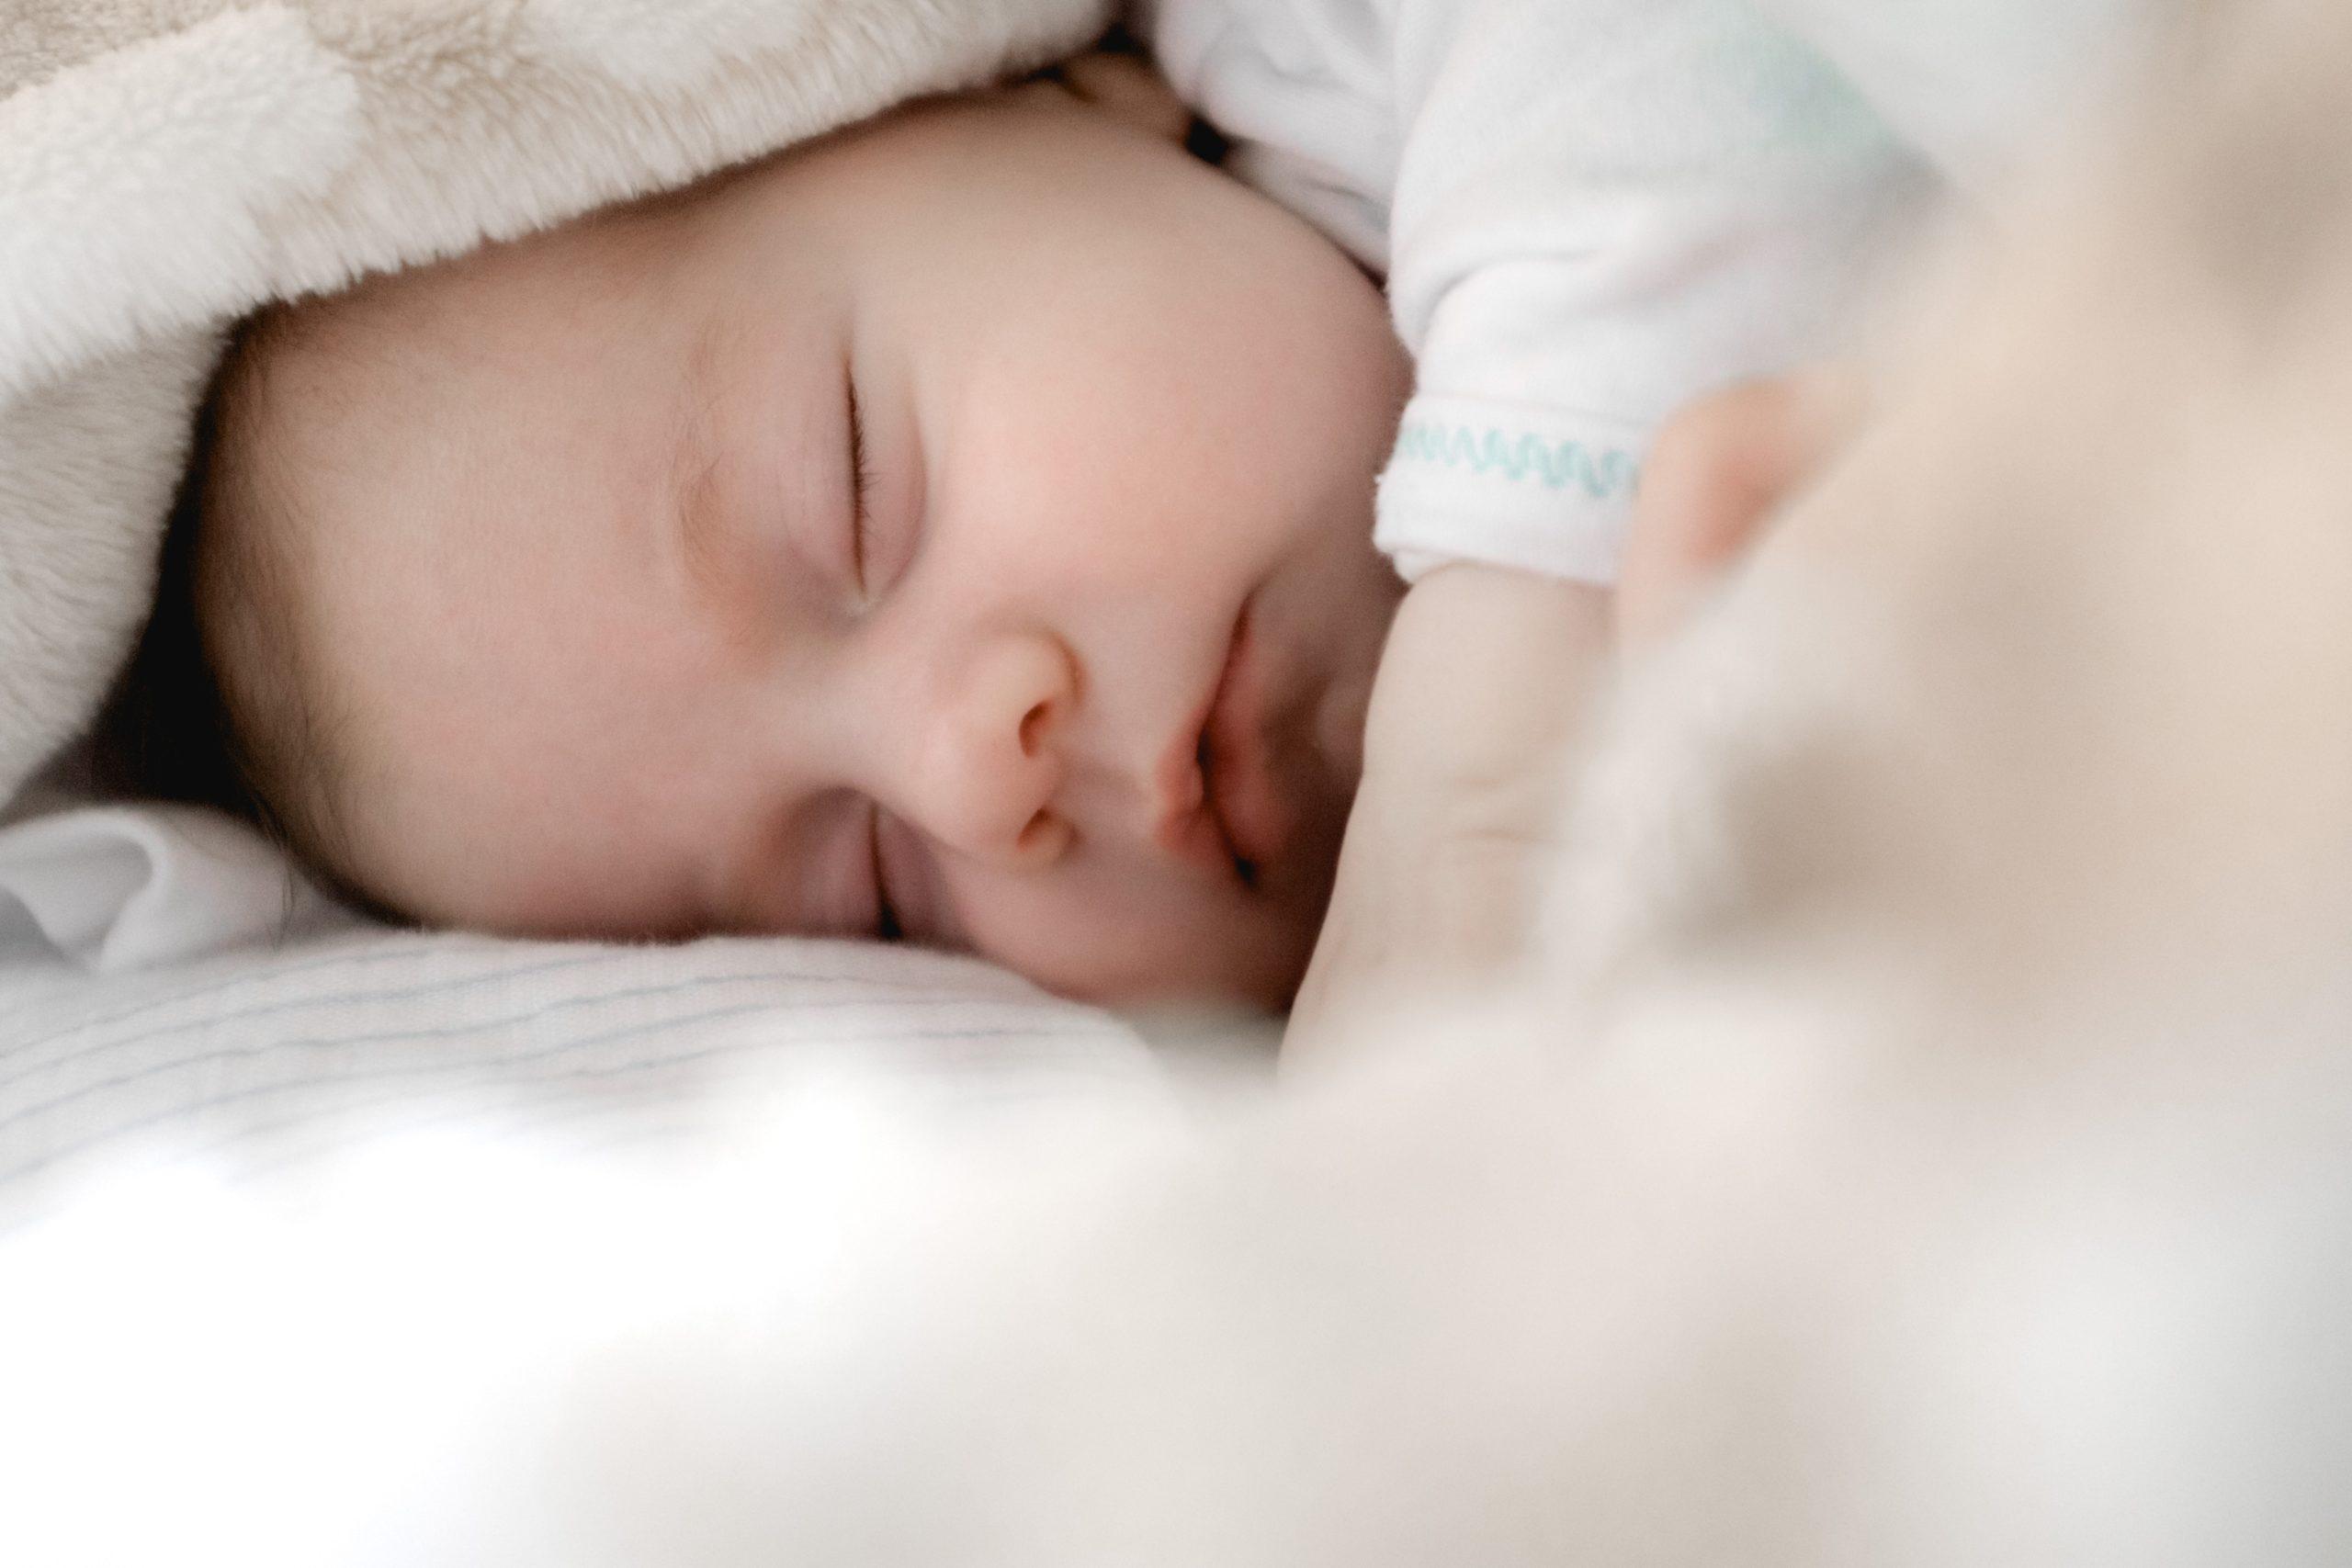 divorcing with newborn